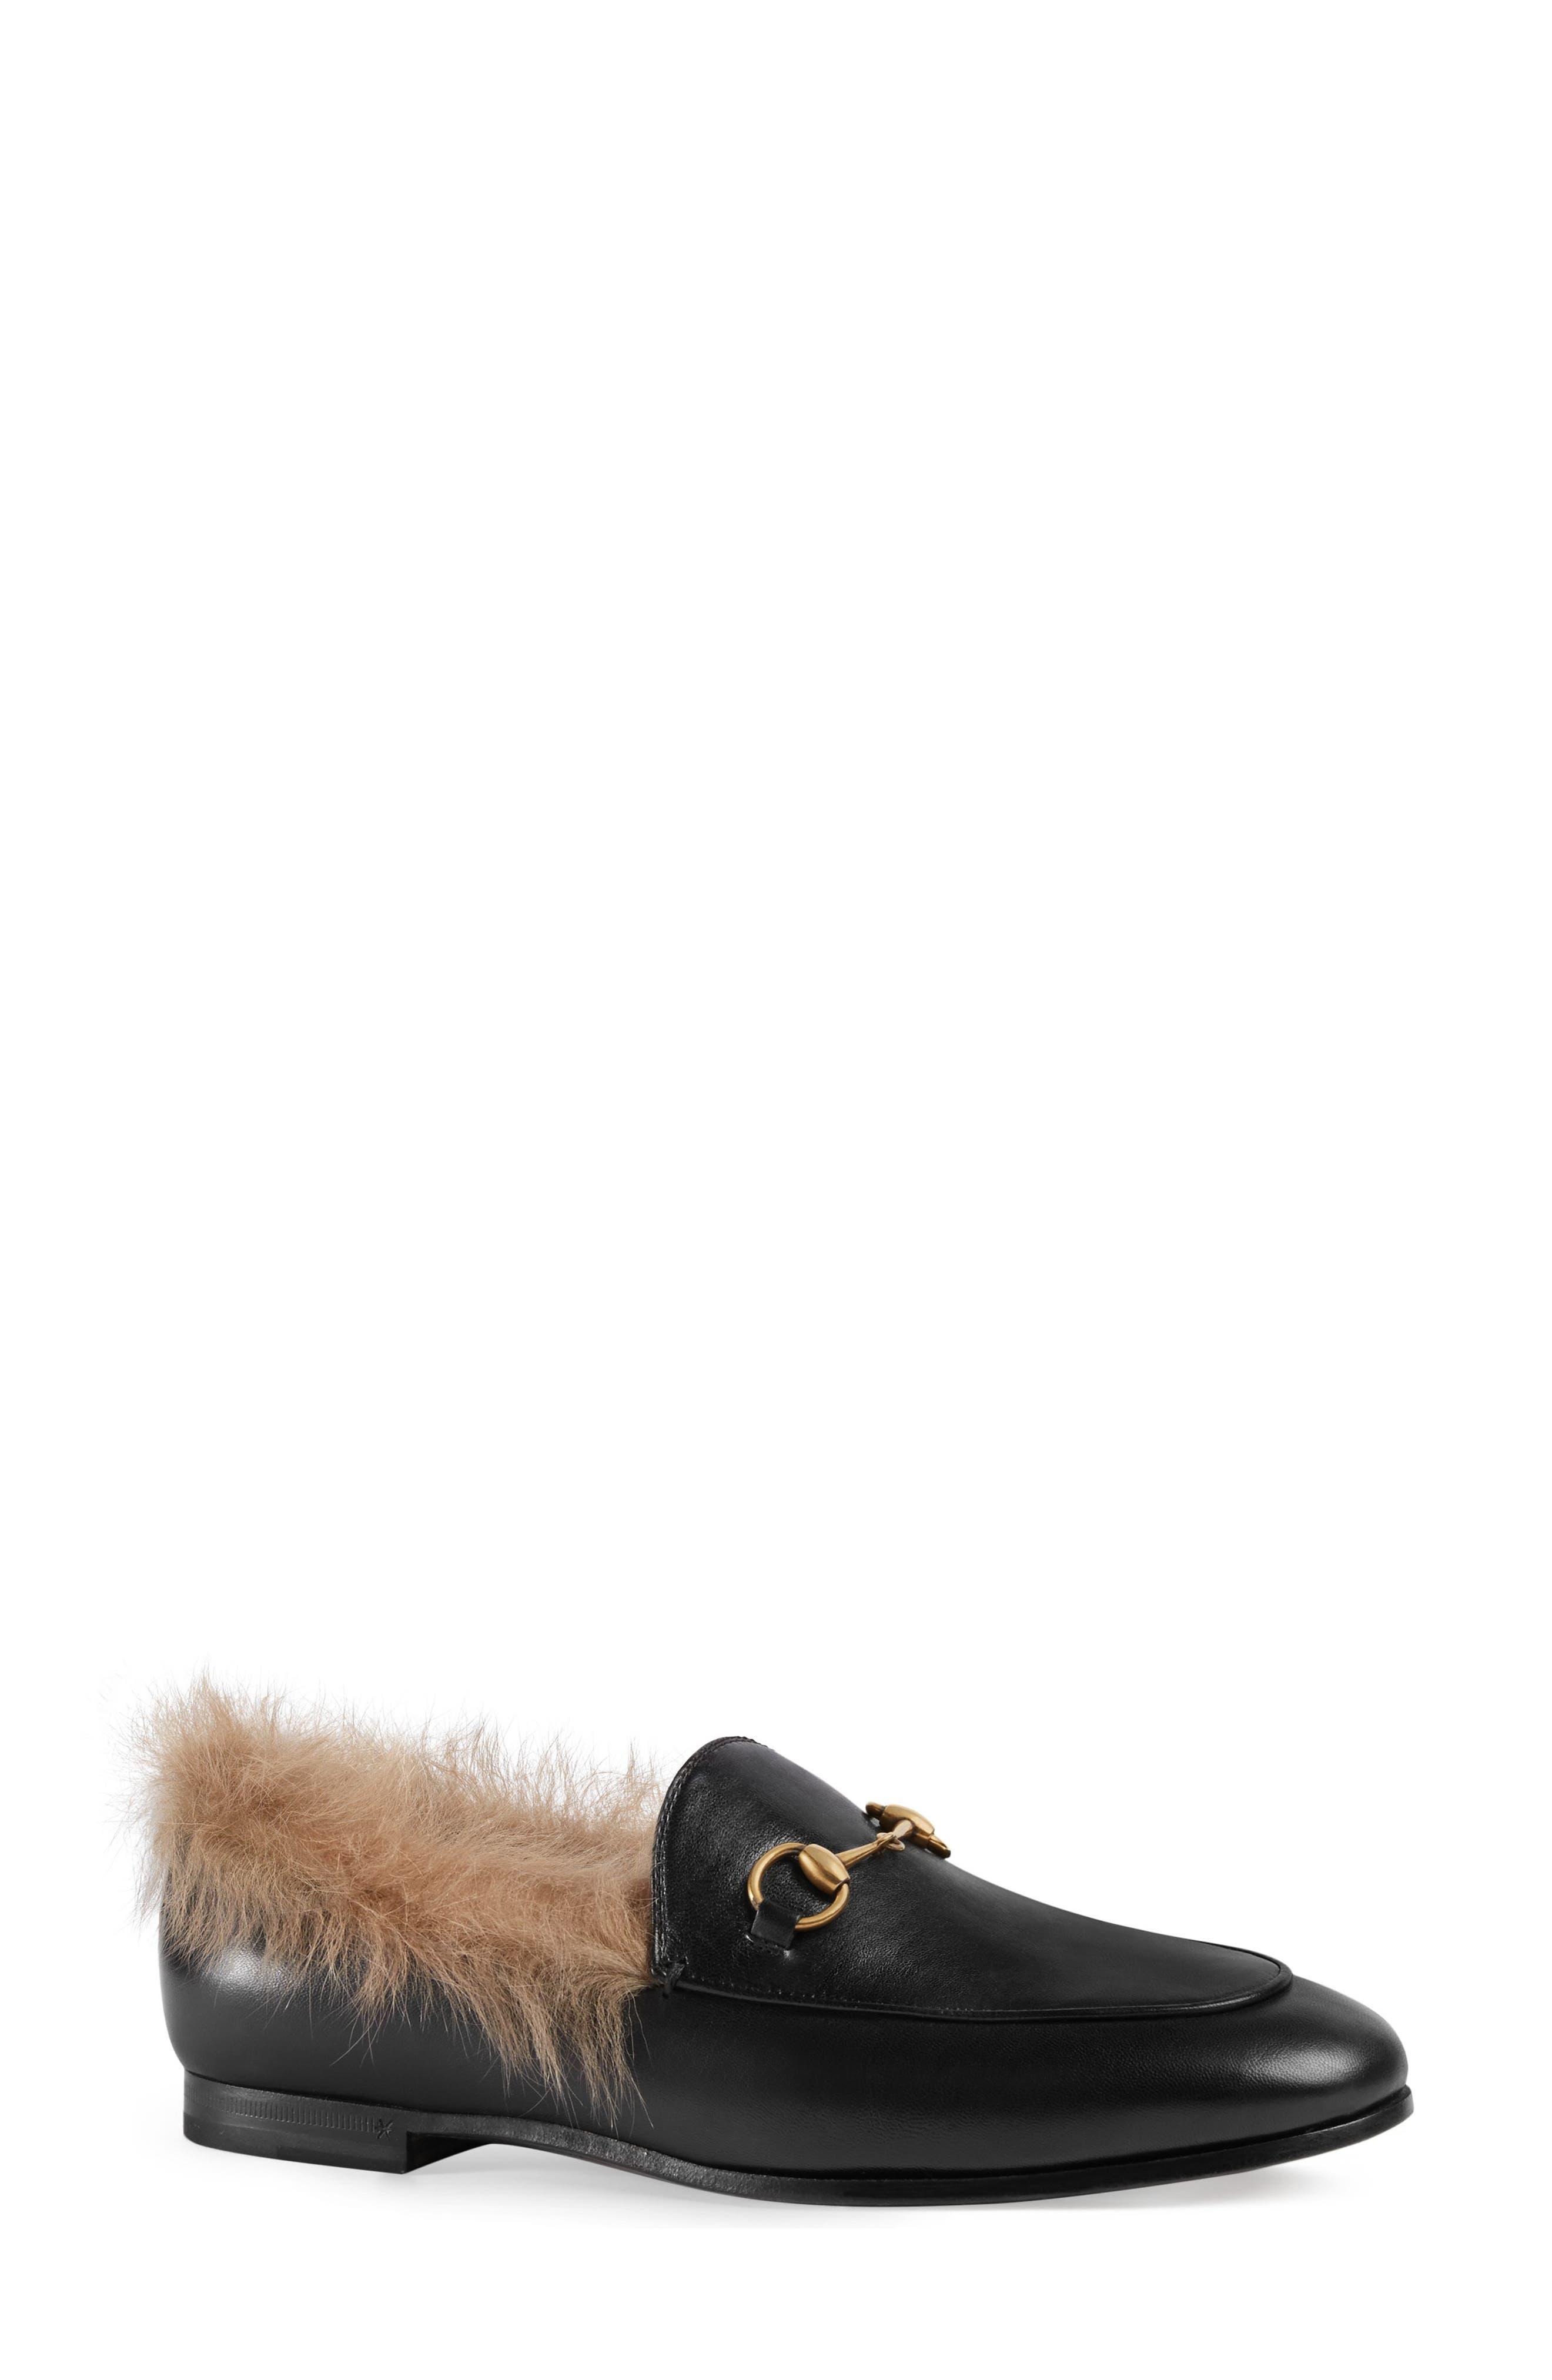 Gucci Jordaan Genuine Shearling Lining Loafer, Black